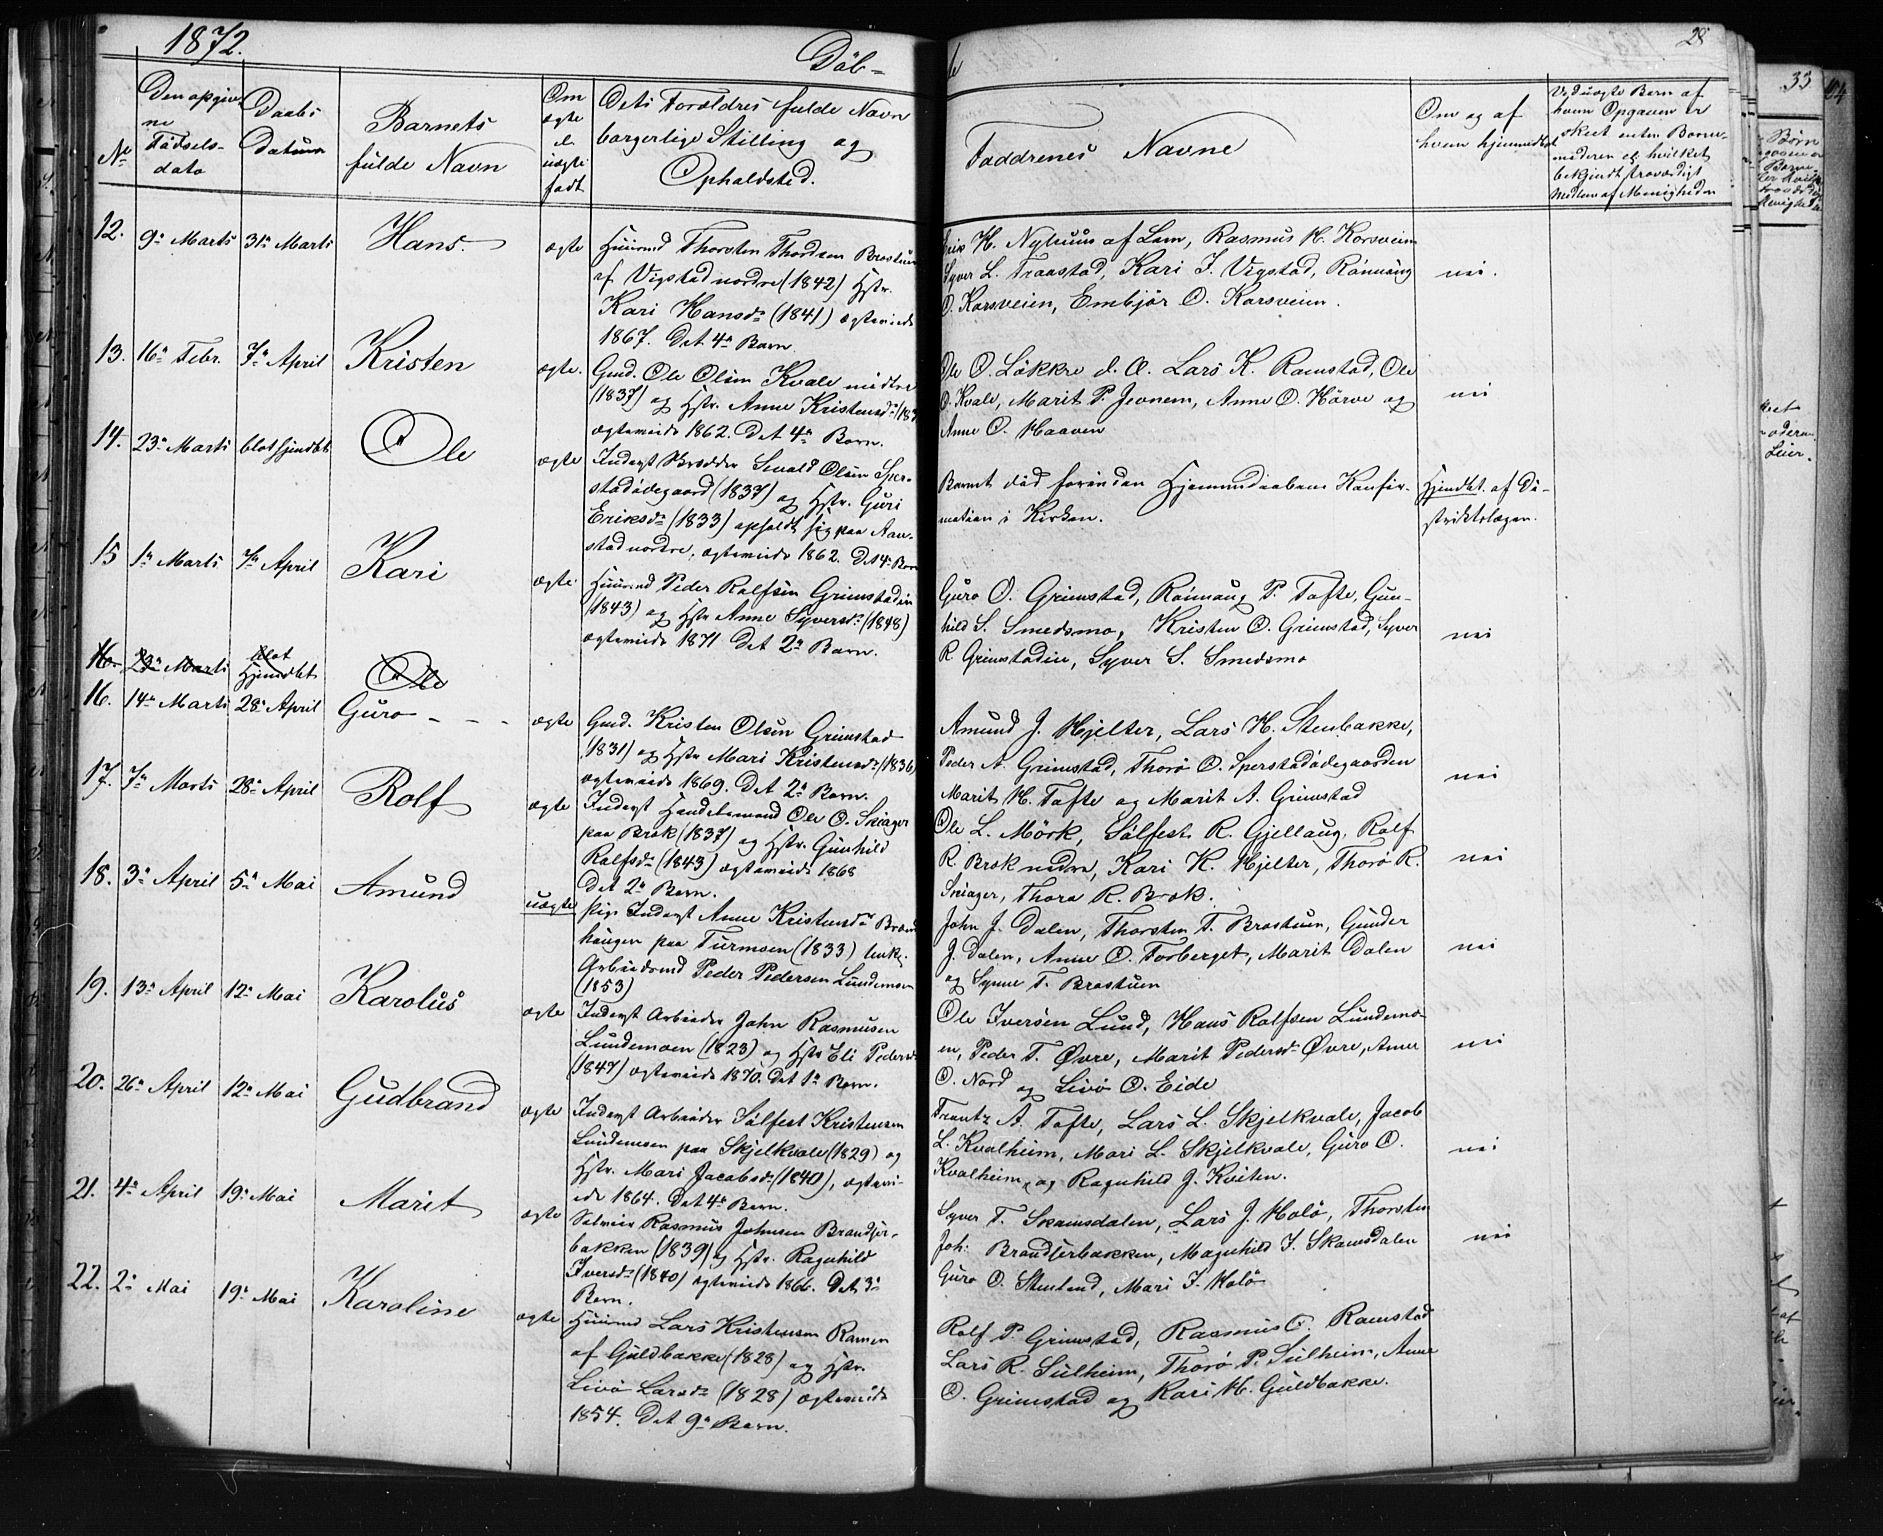 SAH, Skjåk prestekontor, Klokkerbok nr. 1, 1865-1893, s. 28